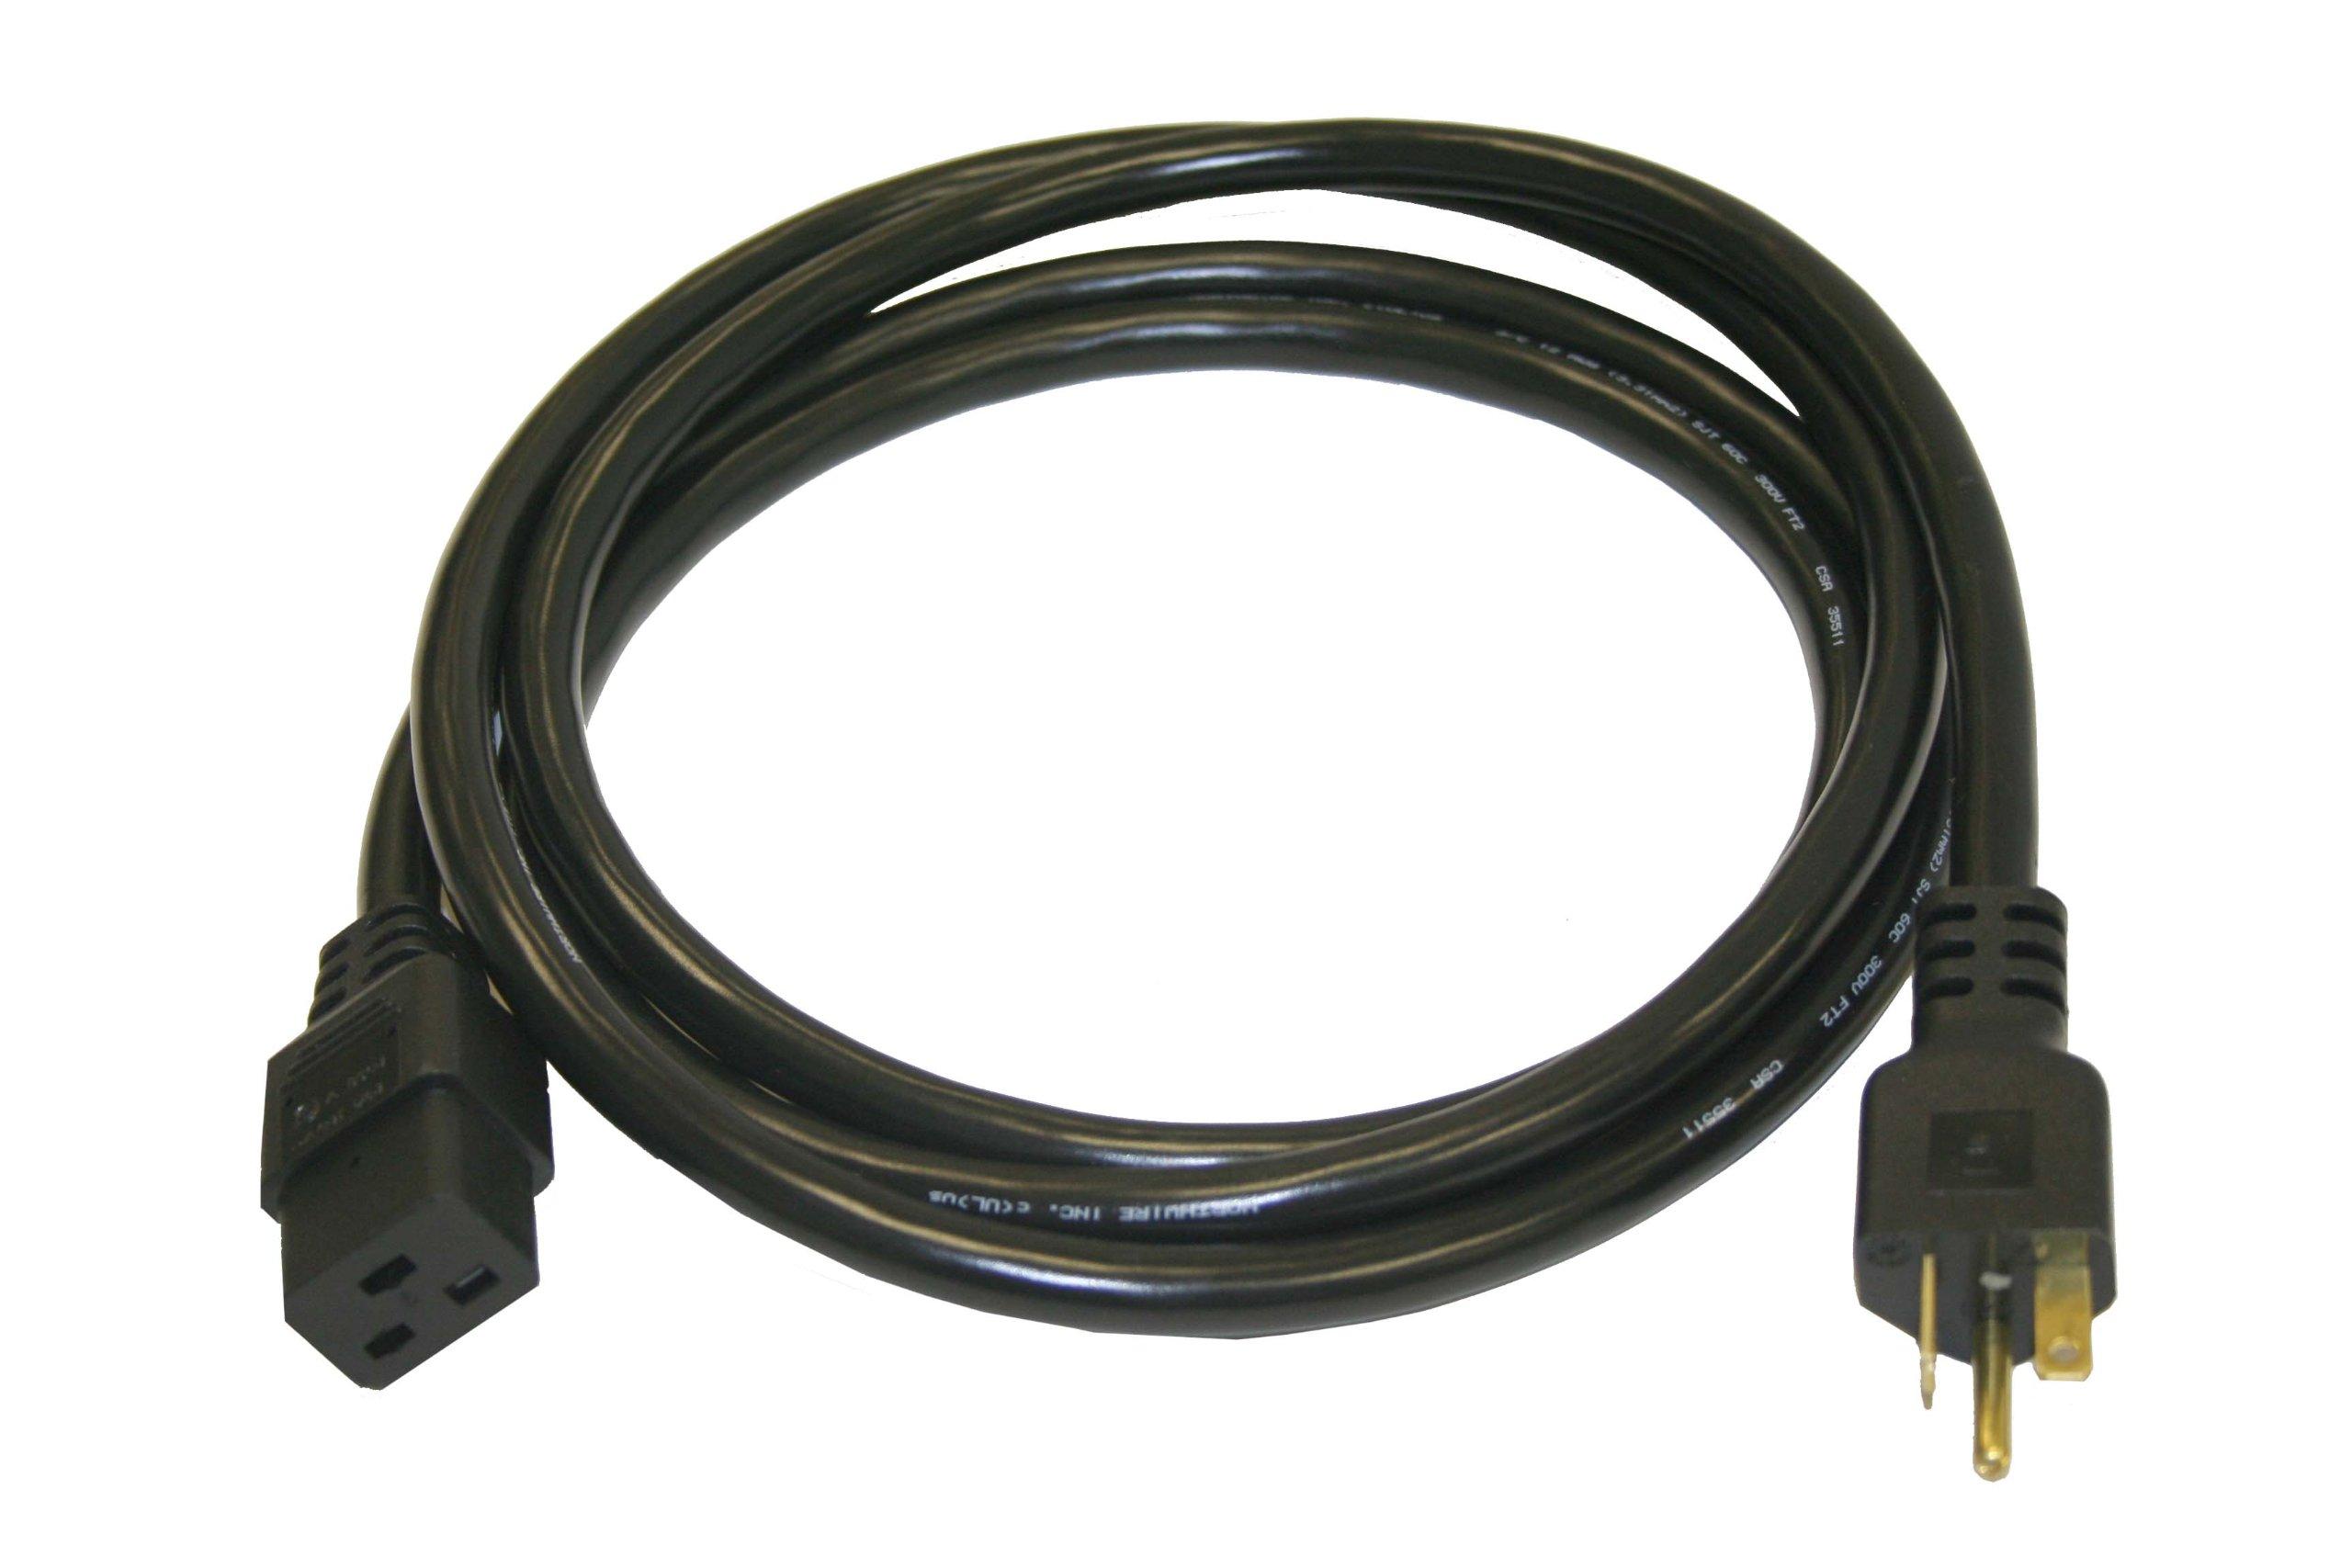 Interpower 86226020 North American NEMA 5-20P, Cord Set, NEMA 5-20P Plug Type, IEC 60320 C19 Connector Type, Black Plug Color, Black Cable Color, 20 Amps, 125 VAC Voltage, 2.5 m Length